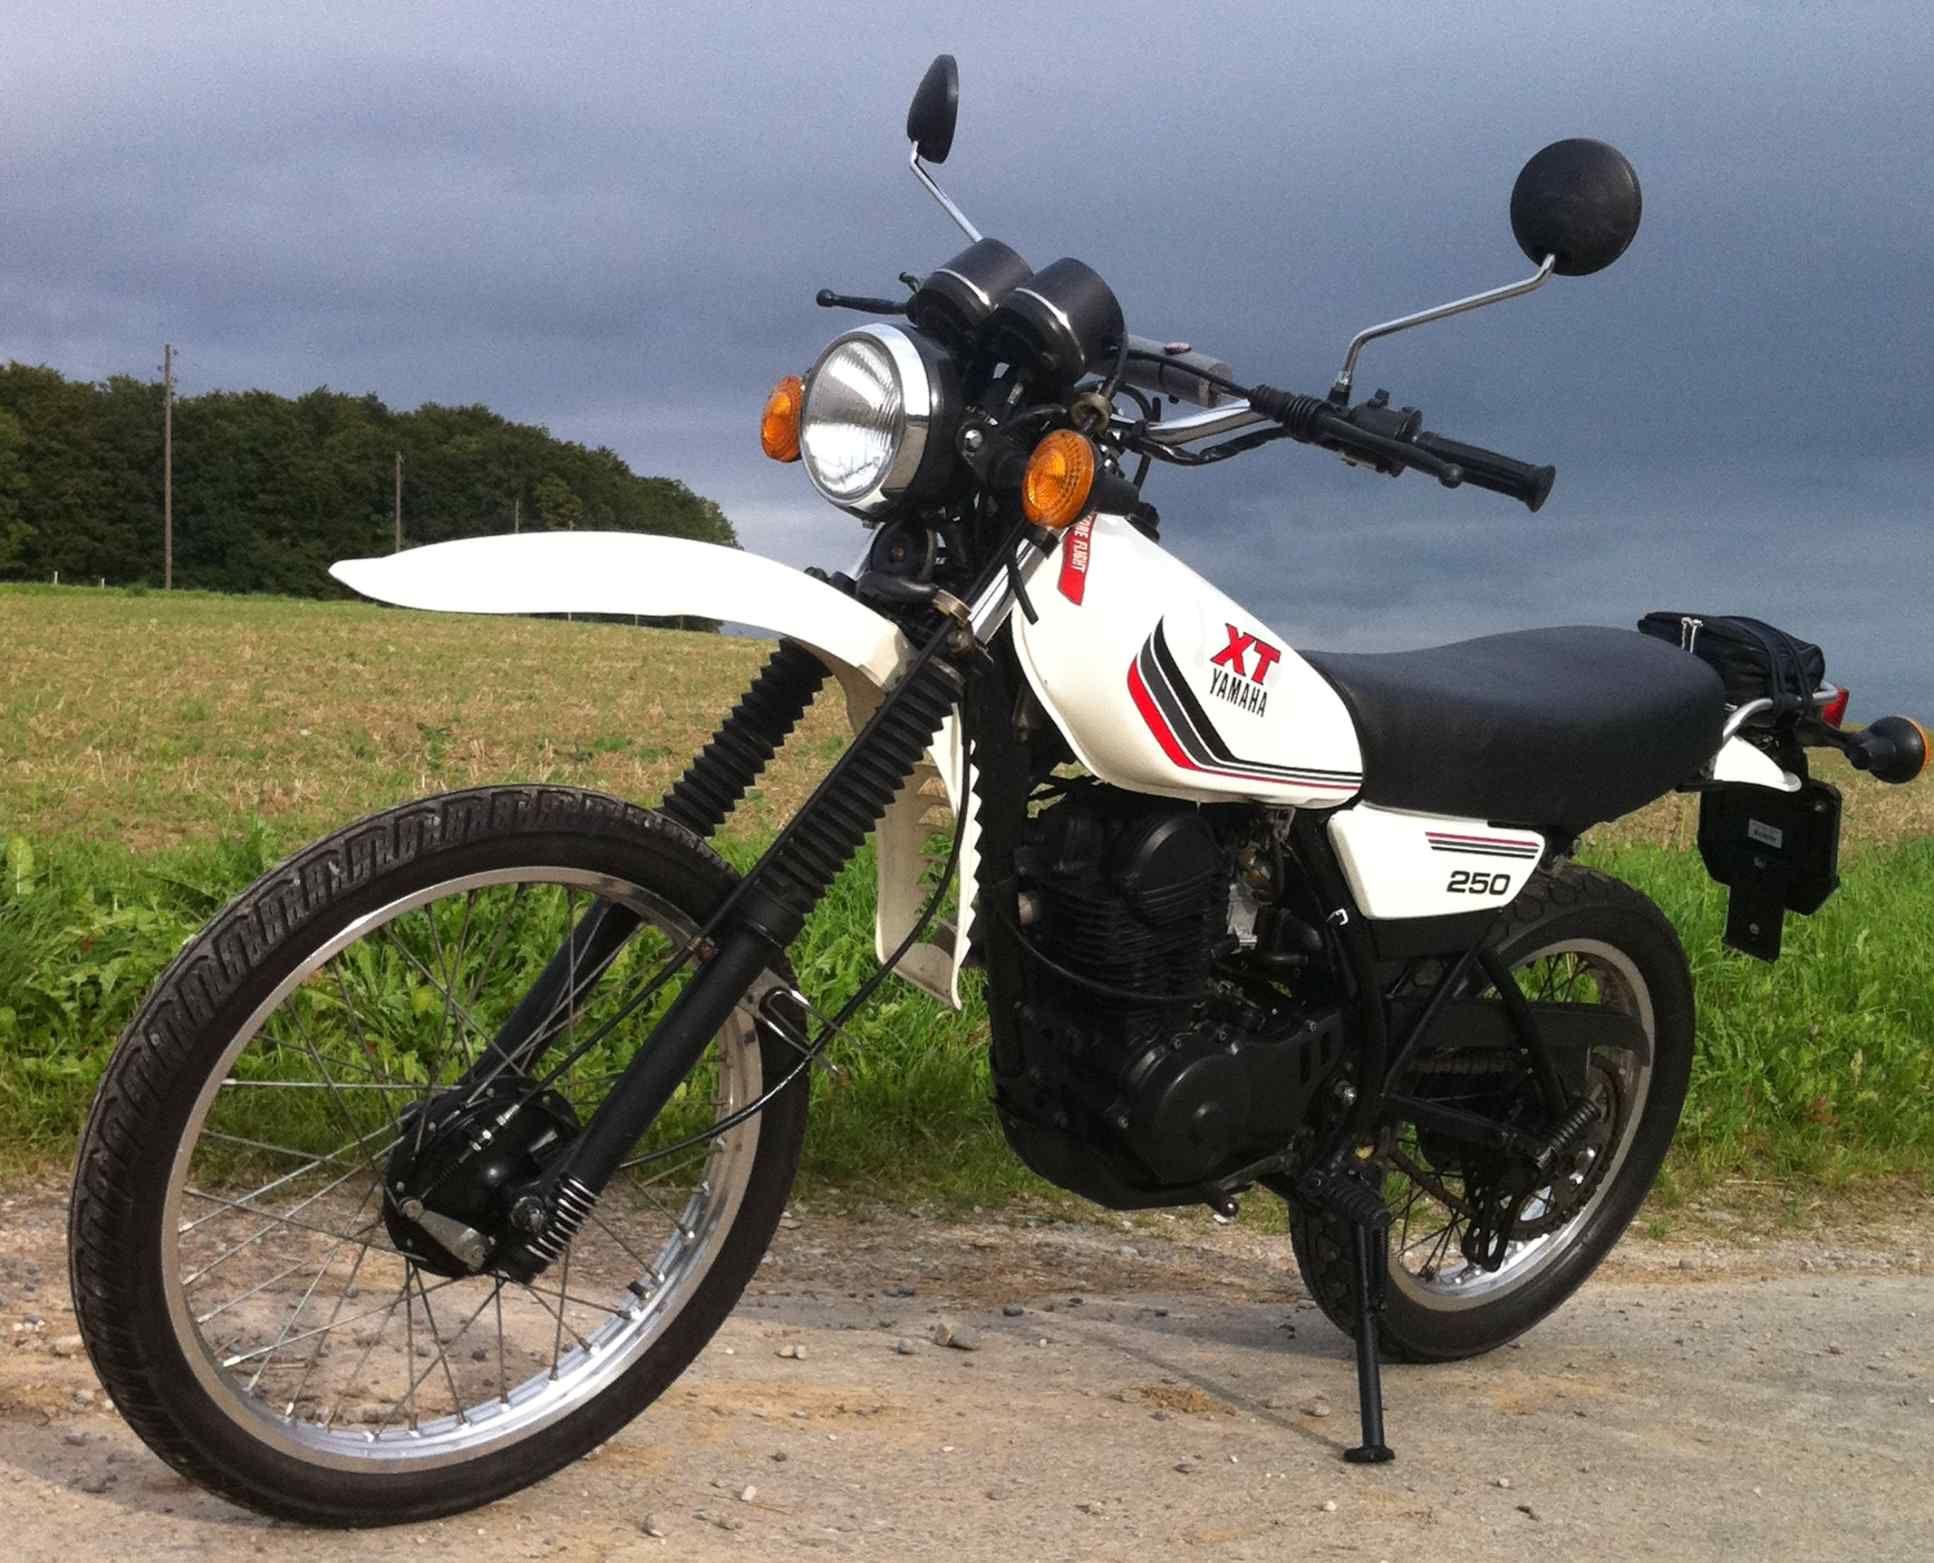 Yamaha Xt125 1984 Enduro Motorcycle Classic Bikes Adventure Bike